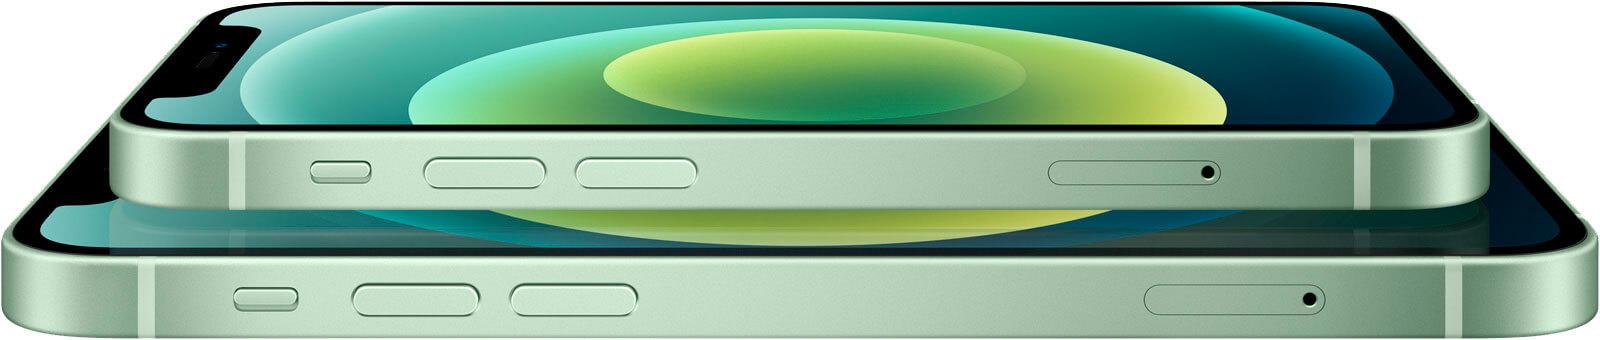 Nuevo iPhone 12 Verde Barato